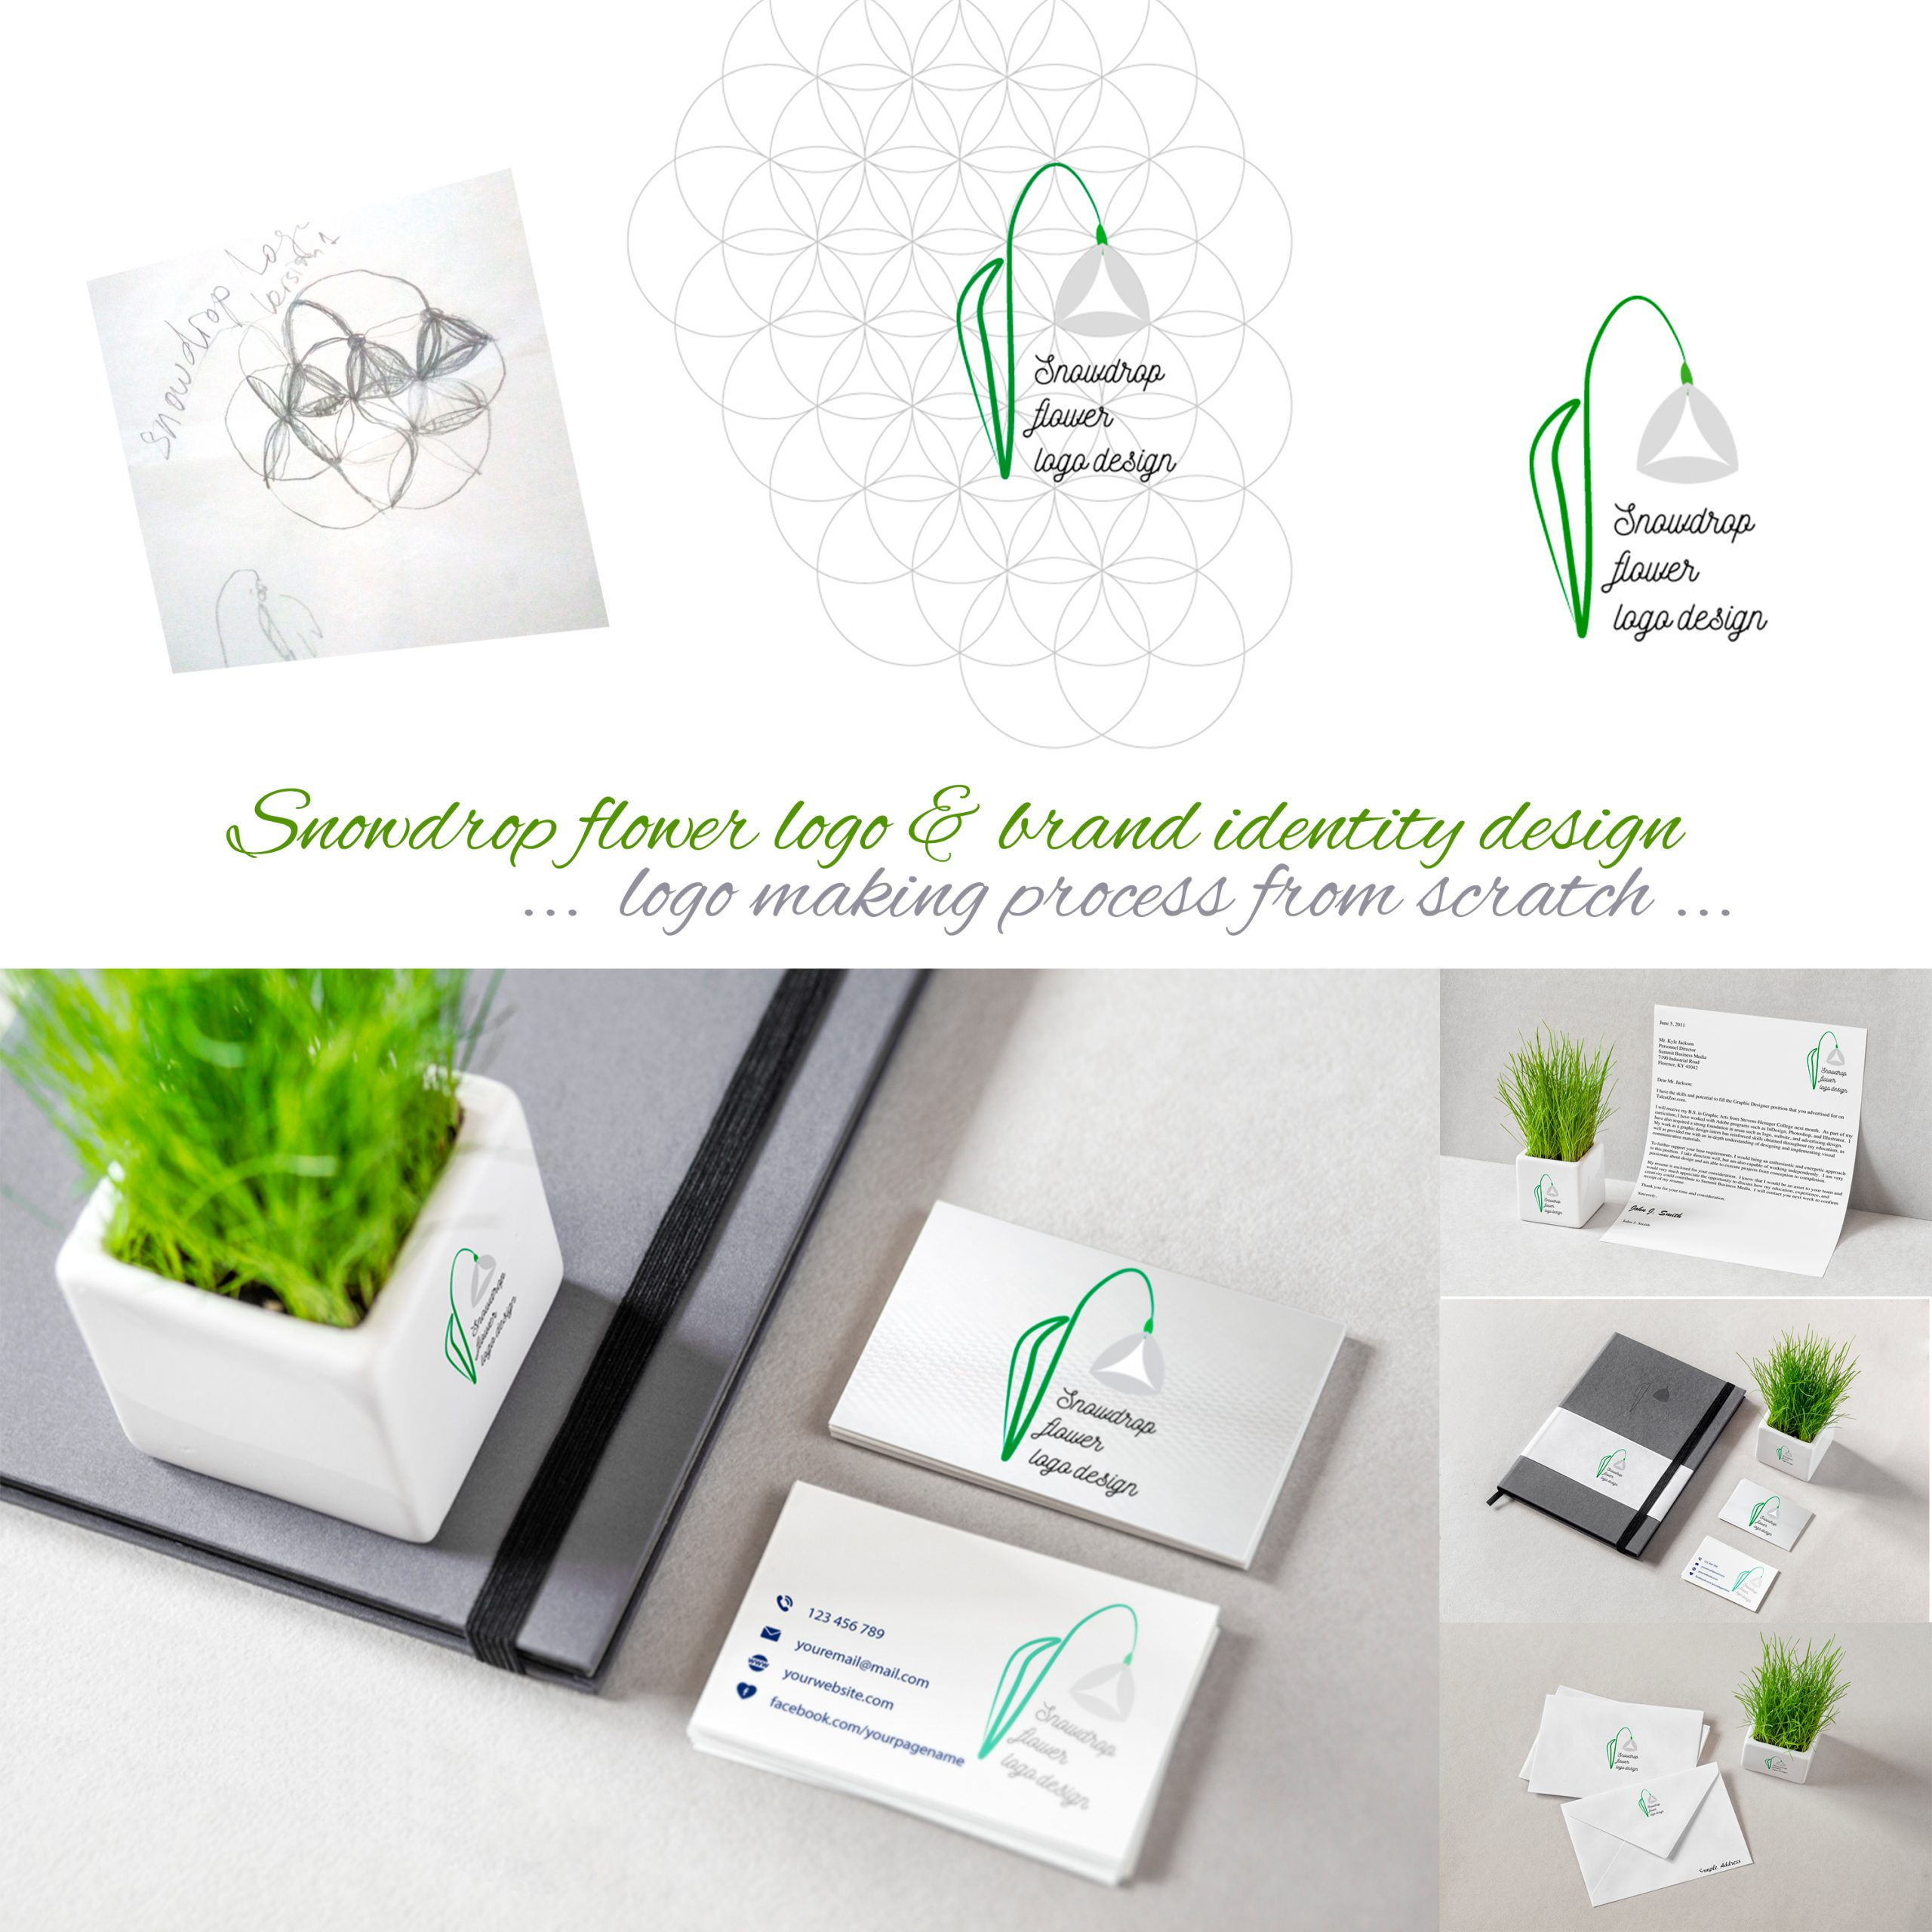 Snowdrop-flower-logo-making-process